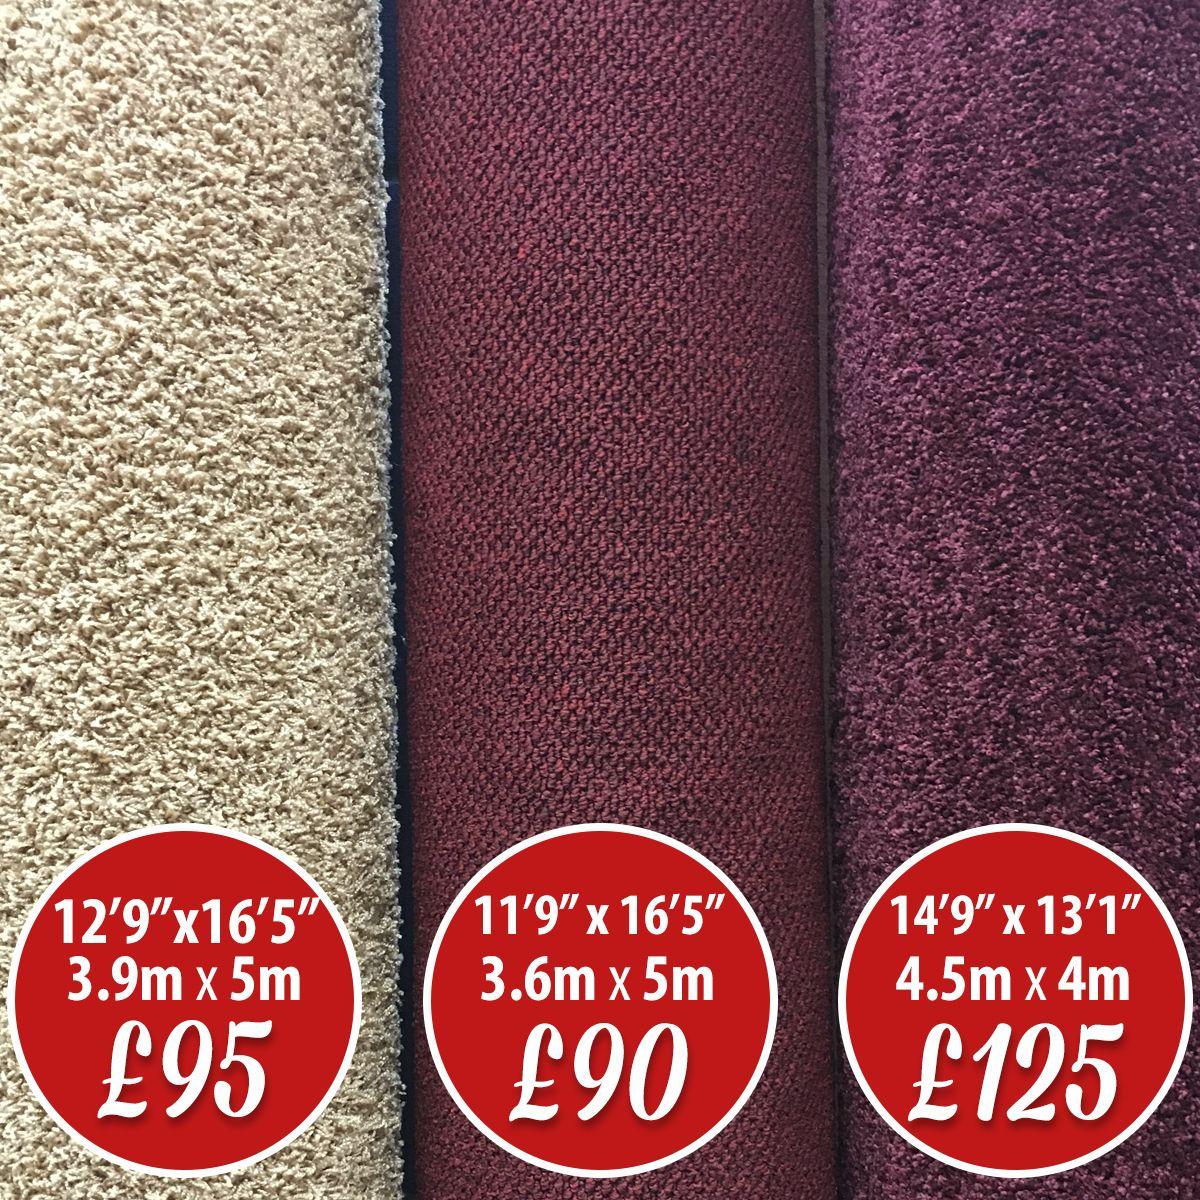 Carpet Roll Ends Sale Beige Left 3 9m X 5m 12 9 X 16 5 95 Middle Carpet We Re Calling This Quality Carpets Local Delivery Service Carpet